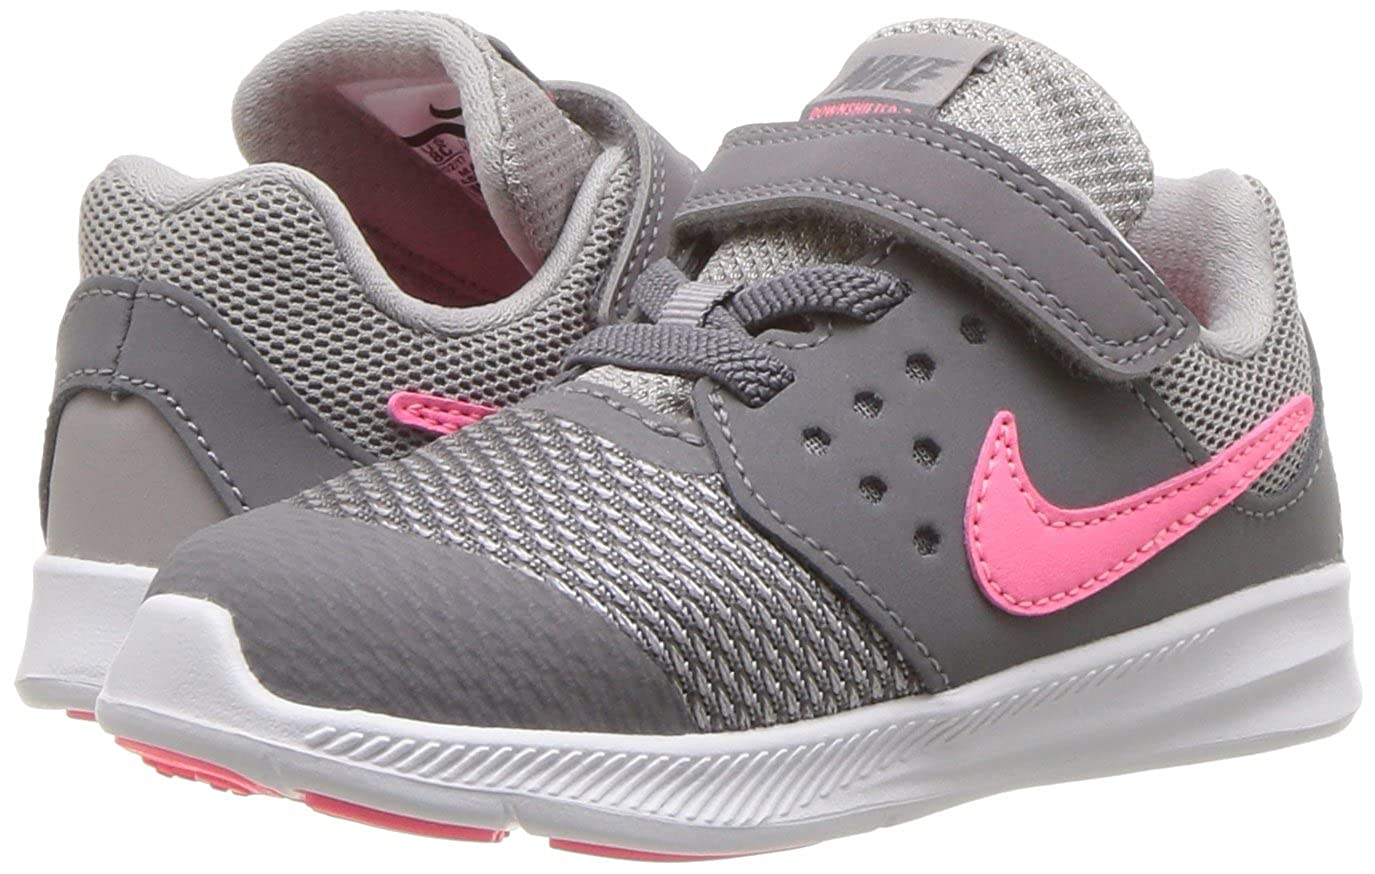 hot sale online 089f0 8fe5c Amazon.com   Nike Kids  Downshifter 7 (TDV) Running Shoe   Running